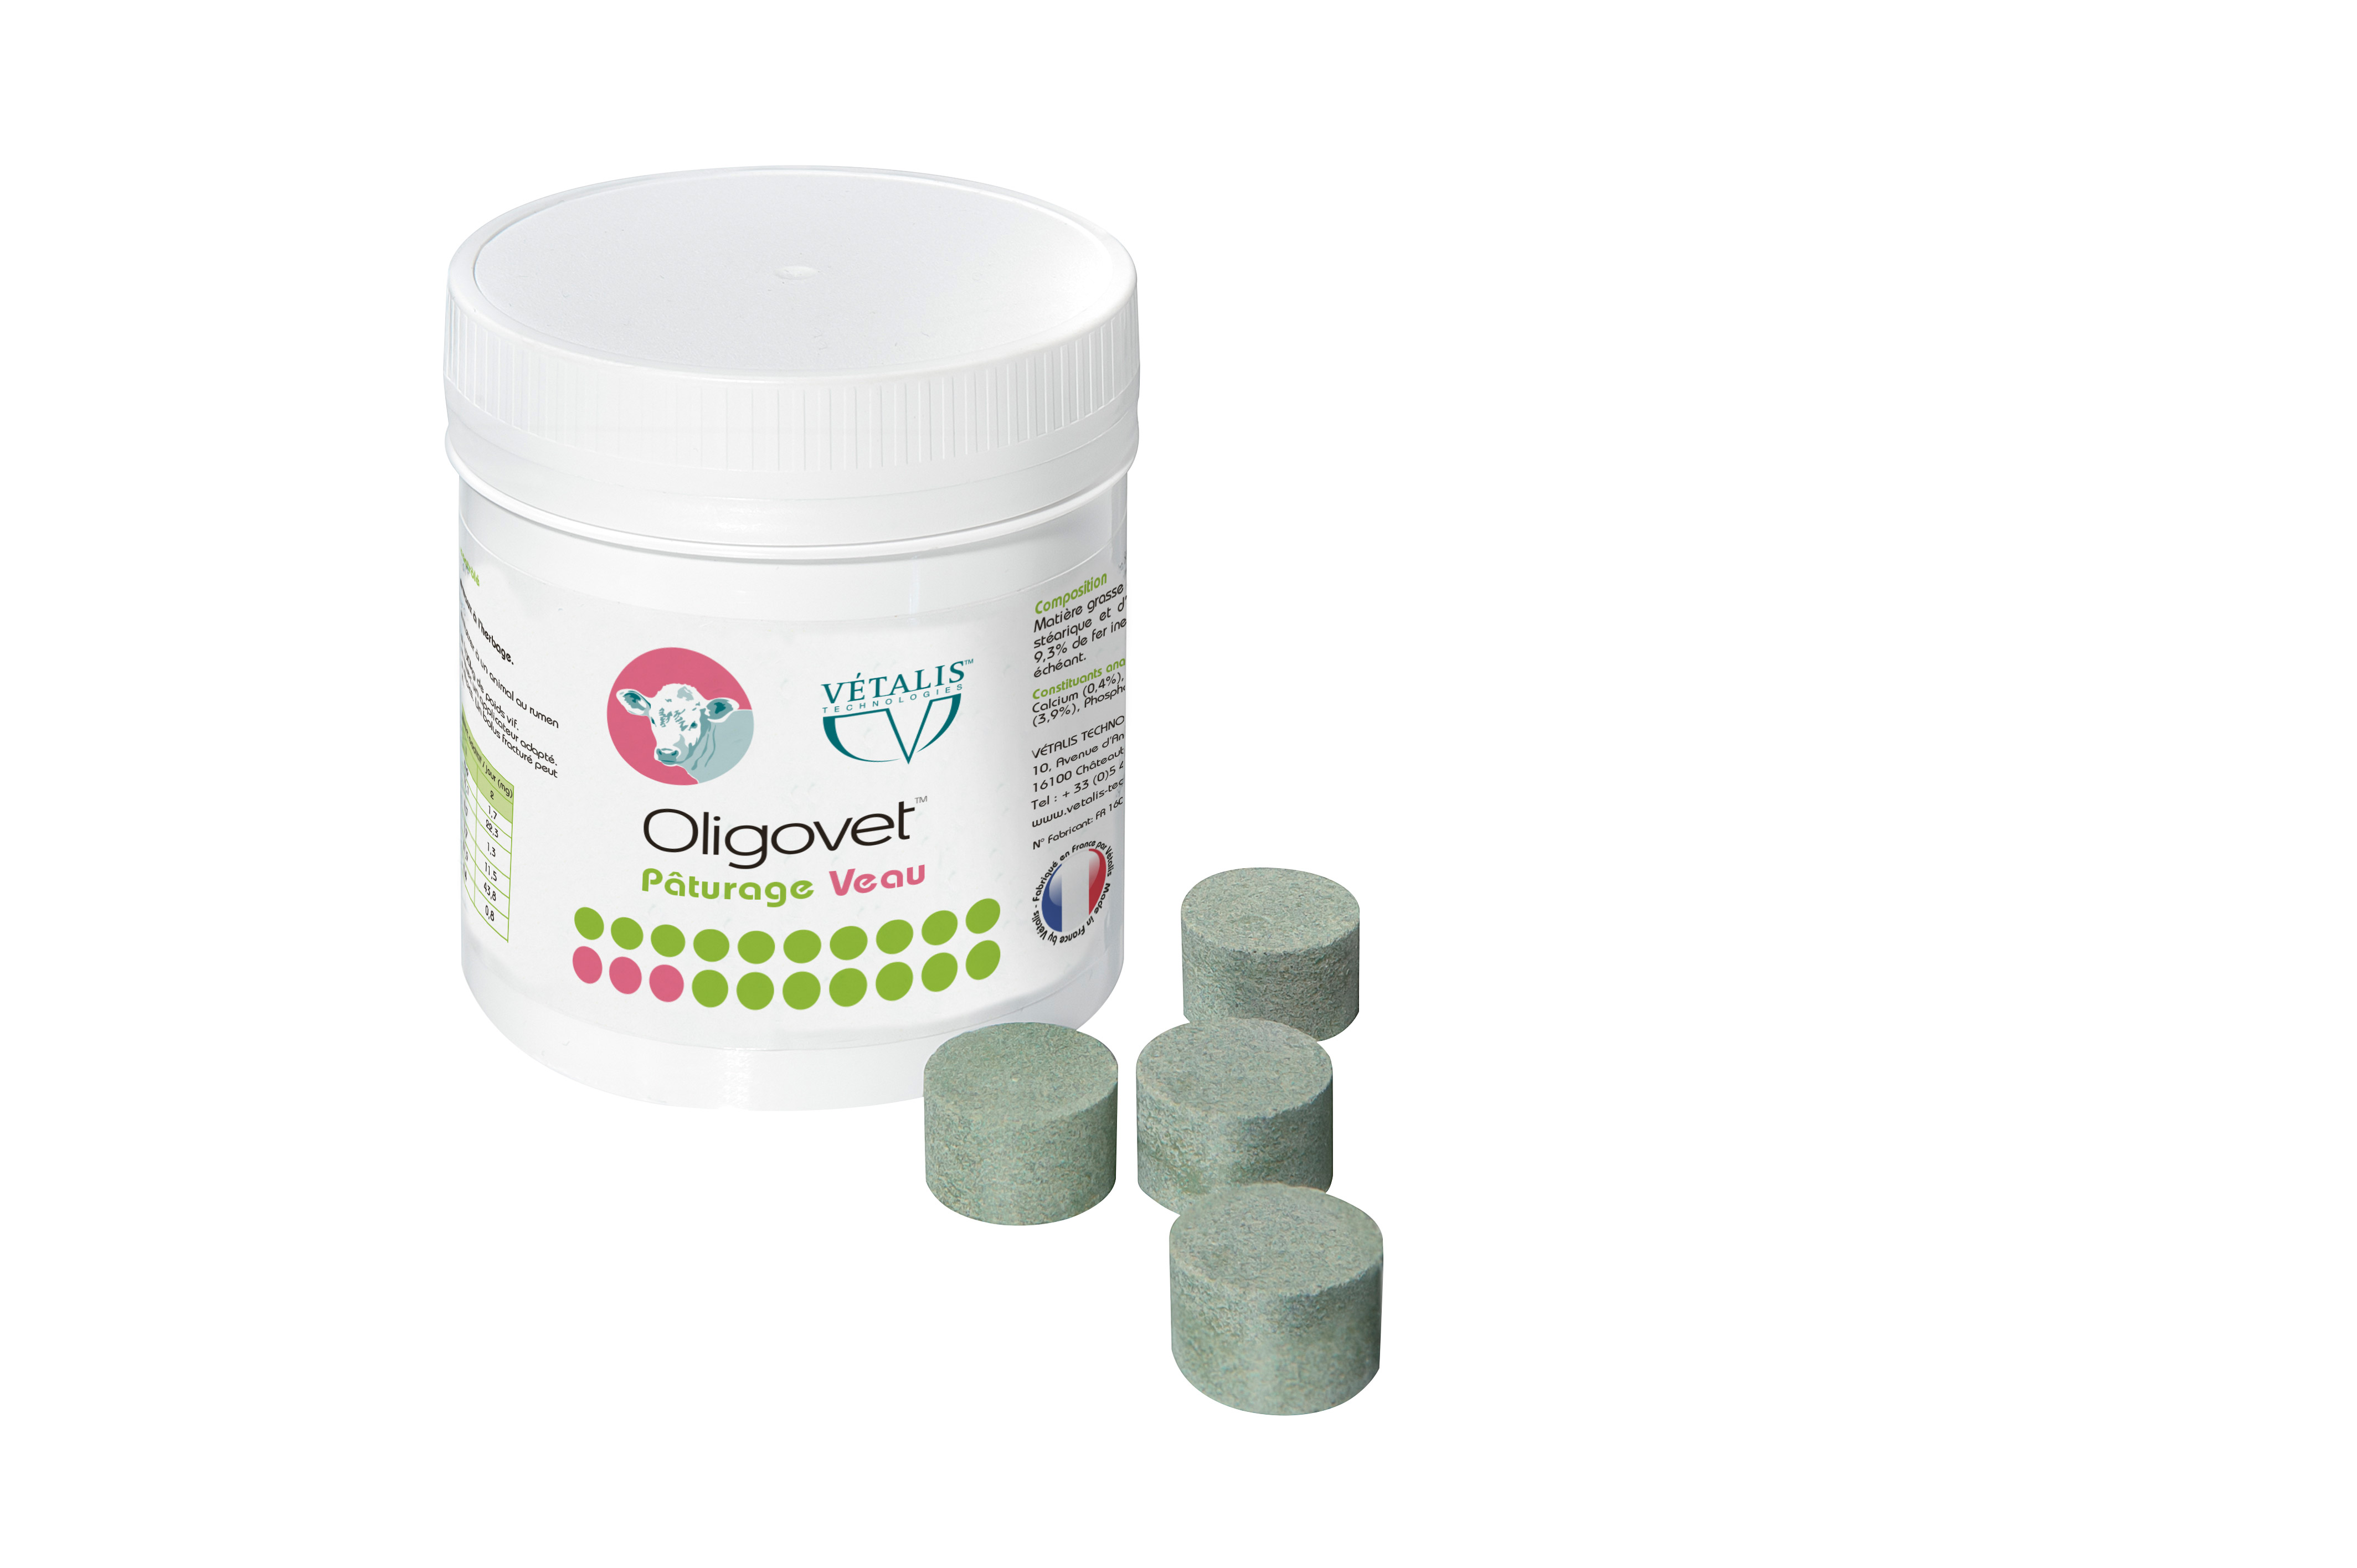 OLIGOVET® Vétalis® pâturage veau boite de 25 bolus vitamines et oligo-éléments